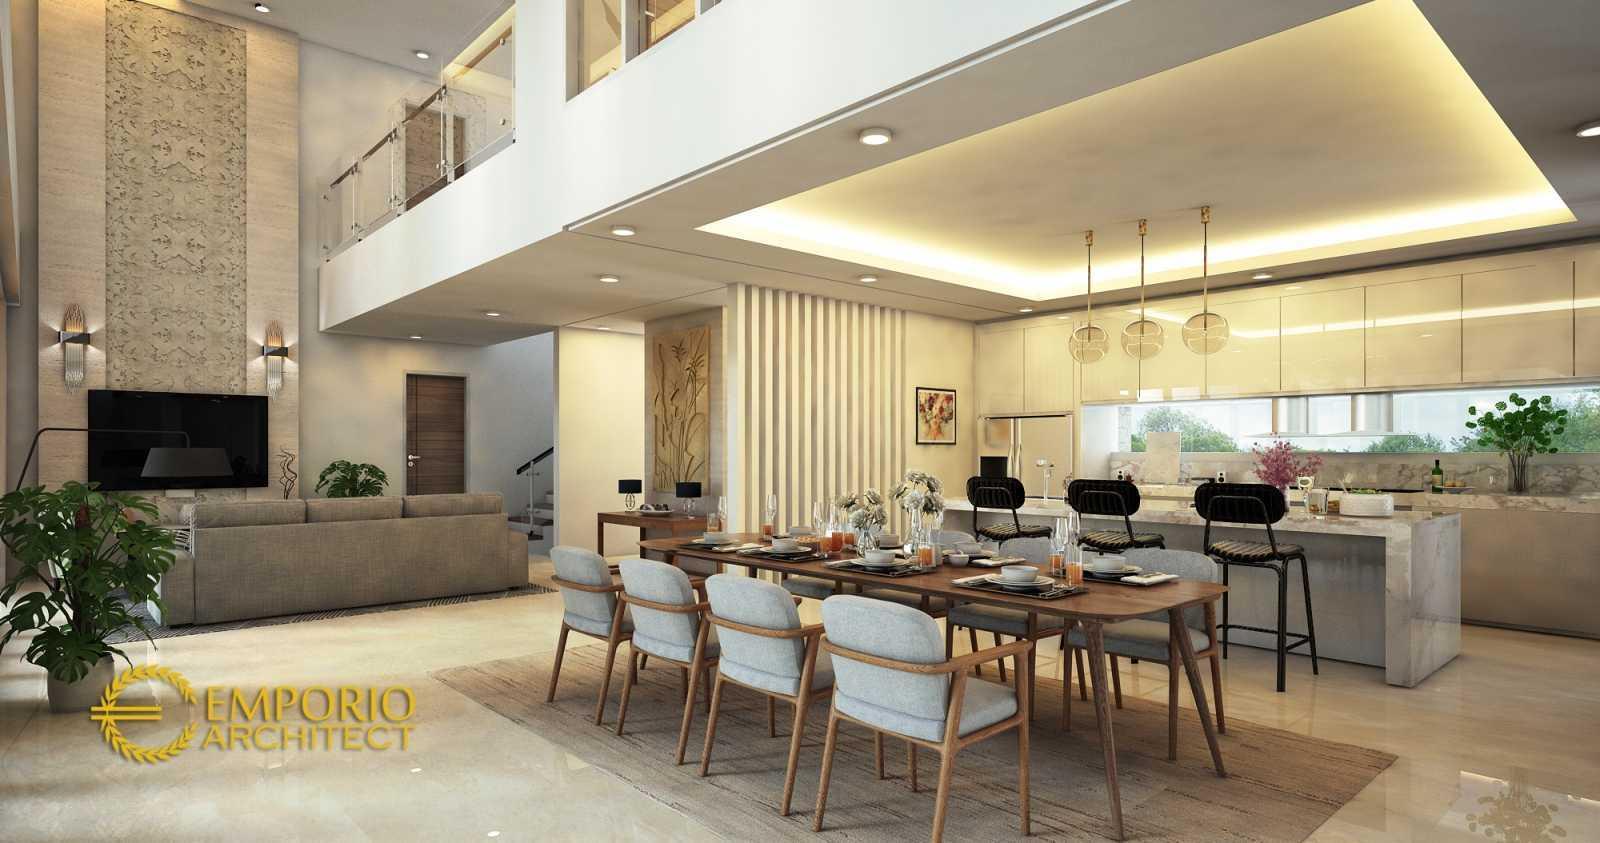 Emporio Architect Desain Rumah Modern Tropis 509 @ Bogor Bogor, Jawa Barat, Indonesia Bogor, Jawa Barat, Indonesia Emporio-Architect-Desain-Rumah-Modern-Tropis-509-Bogor  77569